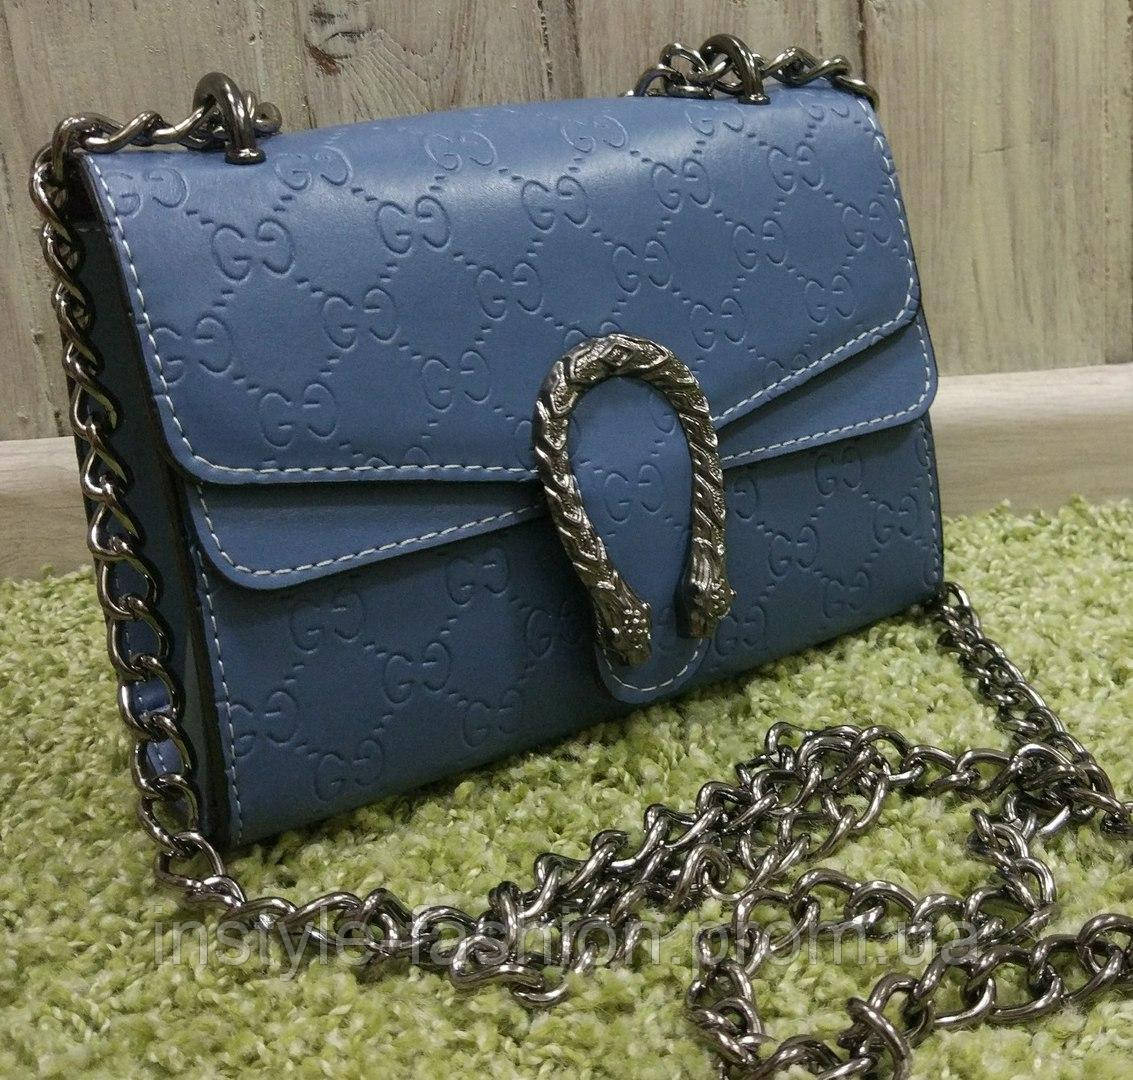 54e0a6293eff Сумка клатч через плечо Gucci Гуччи на цепочке синяя - Сумки брендовые,  кошельки, очки